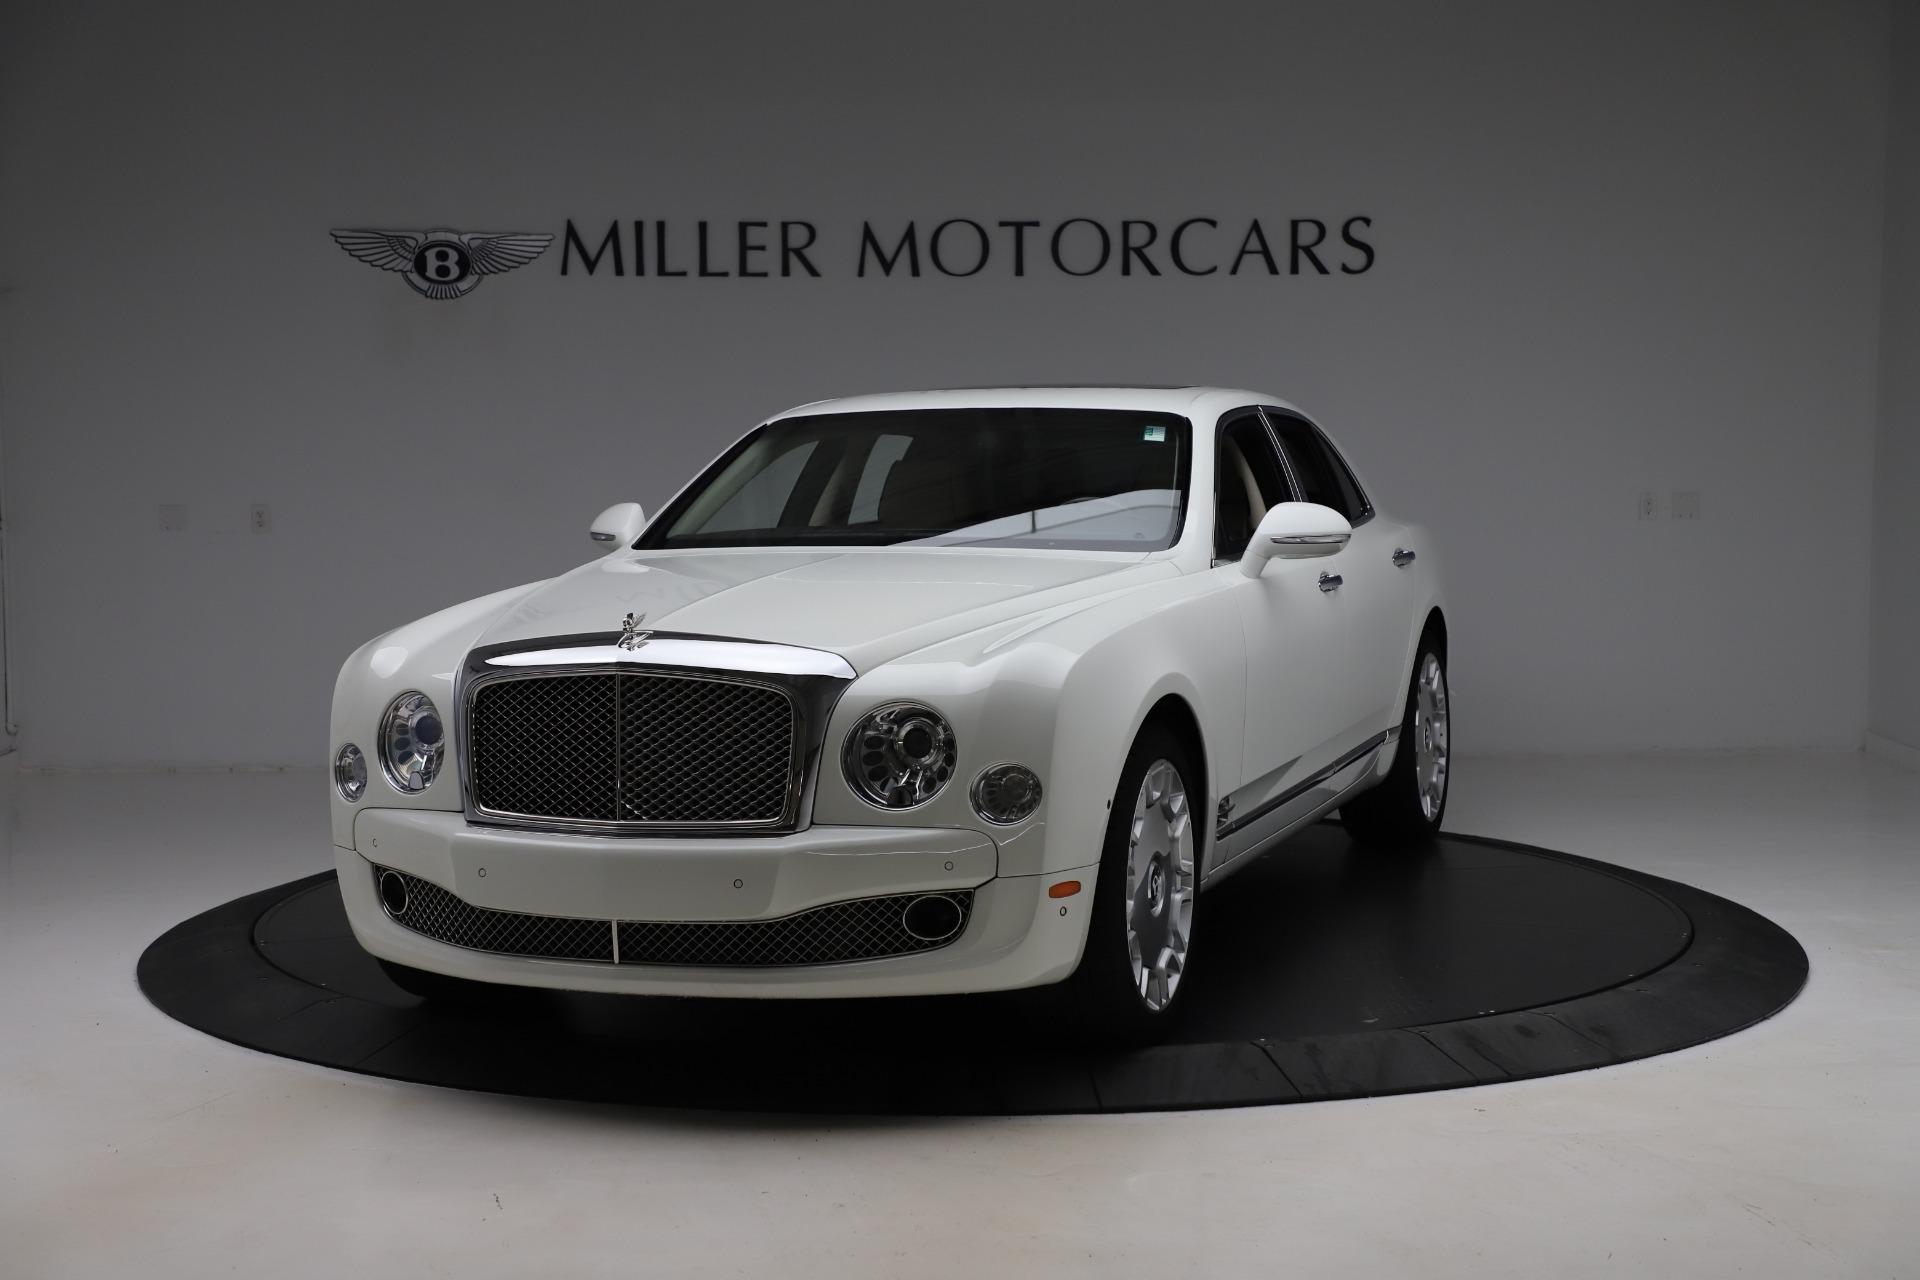 Used 2016 Bentley Mulsanne for sale $145,900 at Rolls-Royce Motor Cars Greenwich in Greenwich CT 06830 1